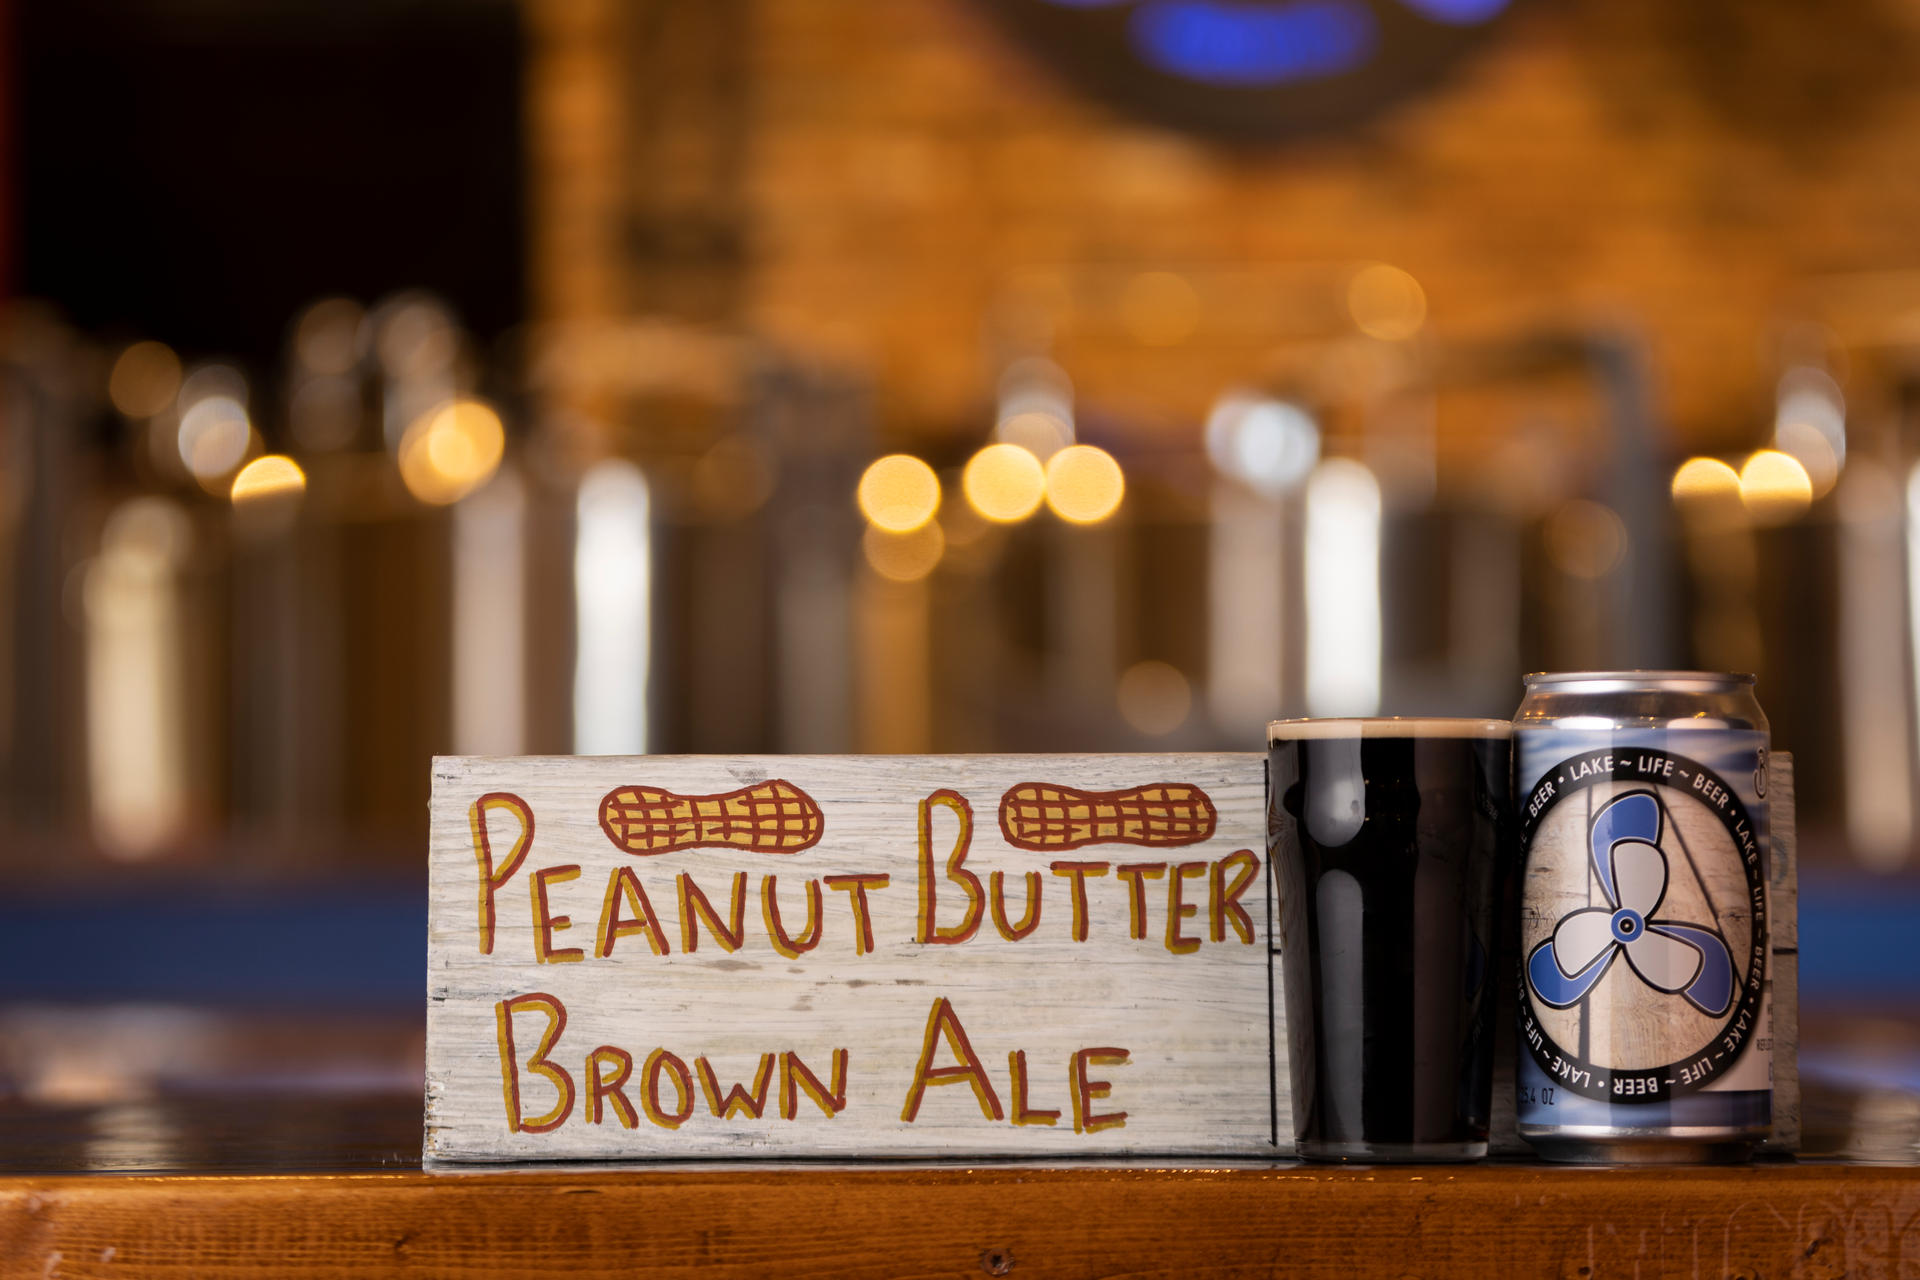 Peanut Butter - Brown Ale